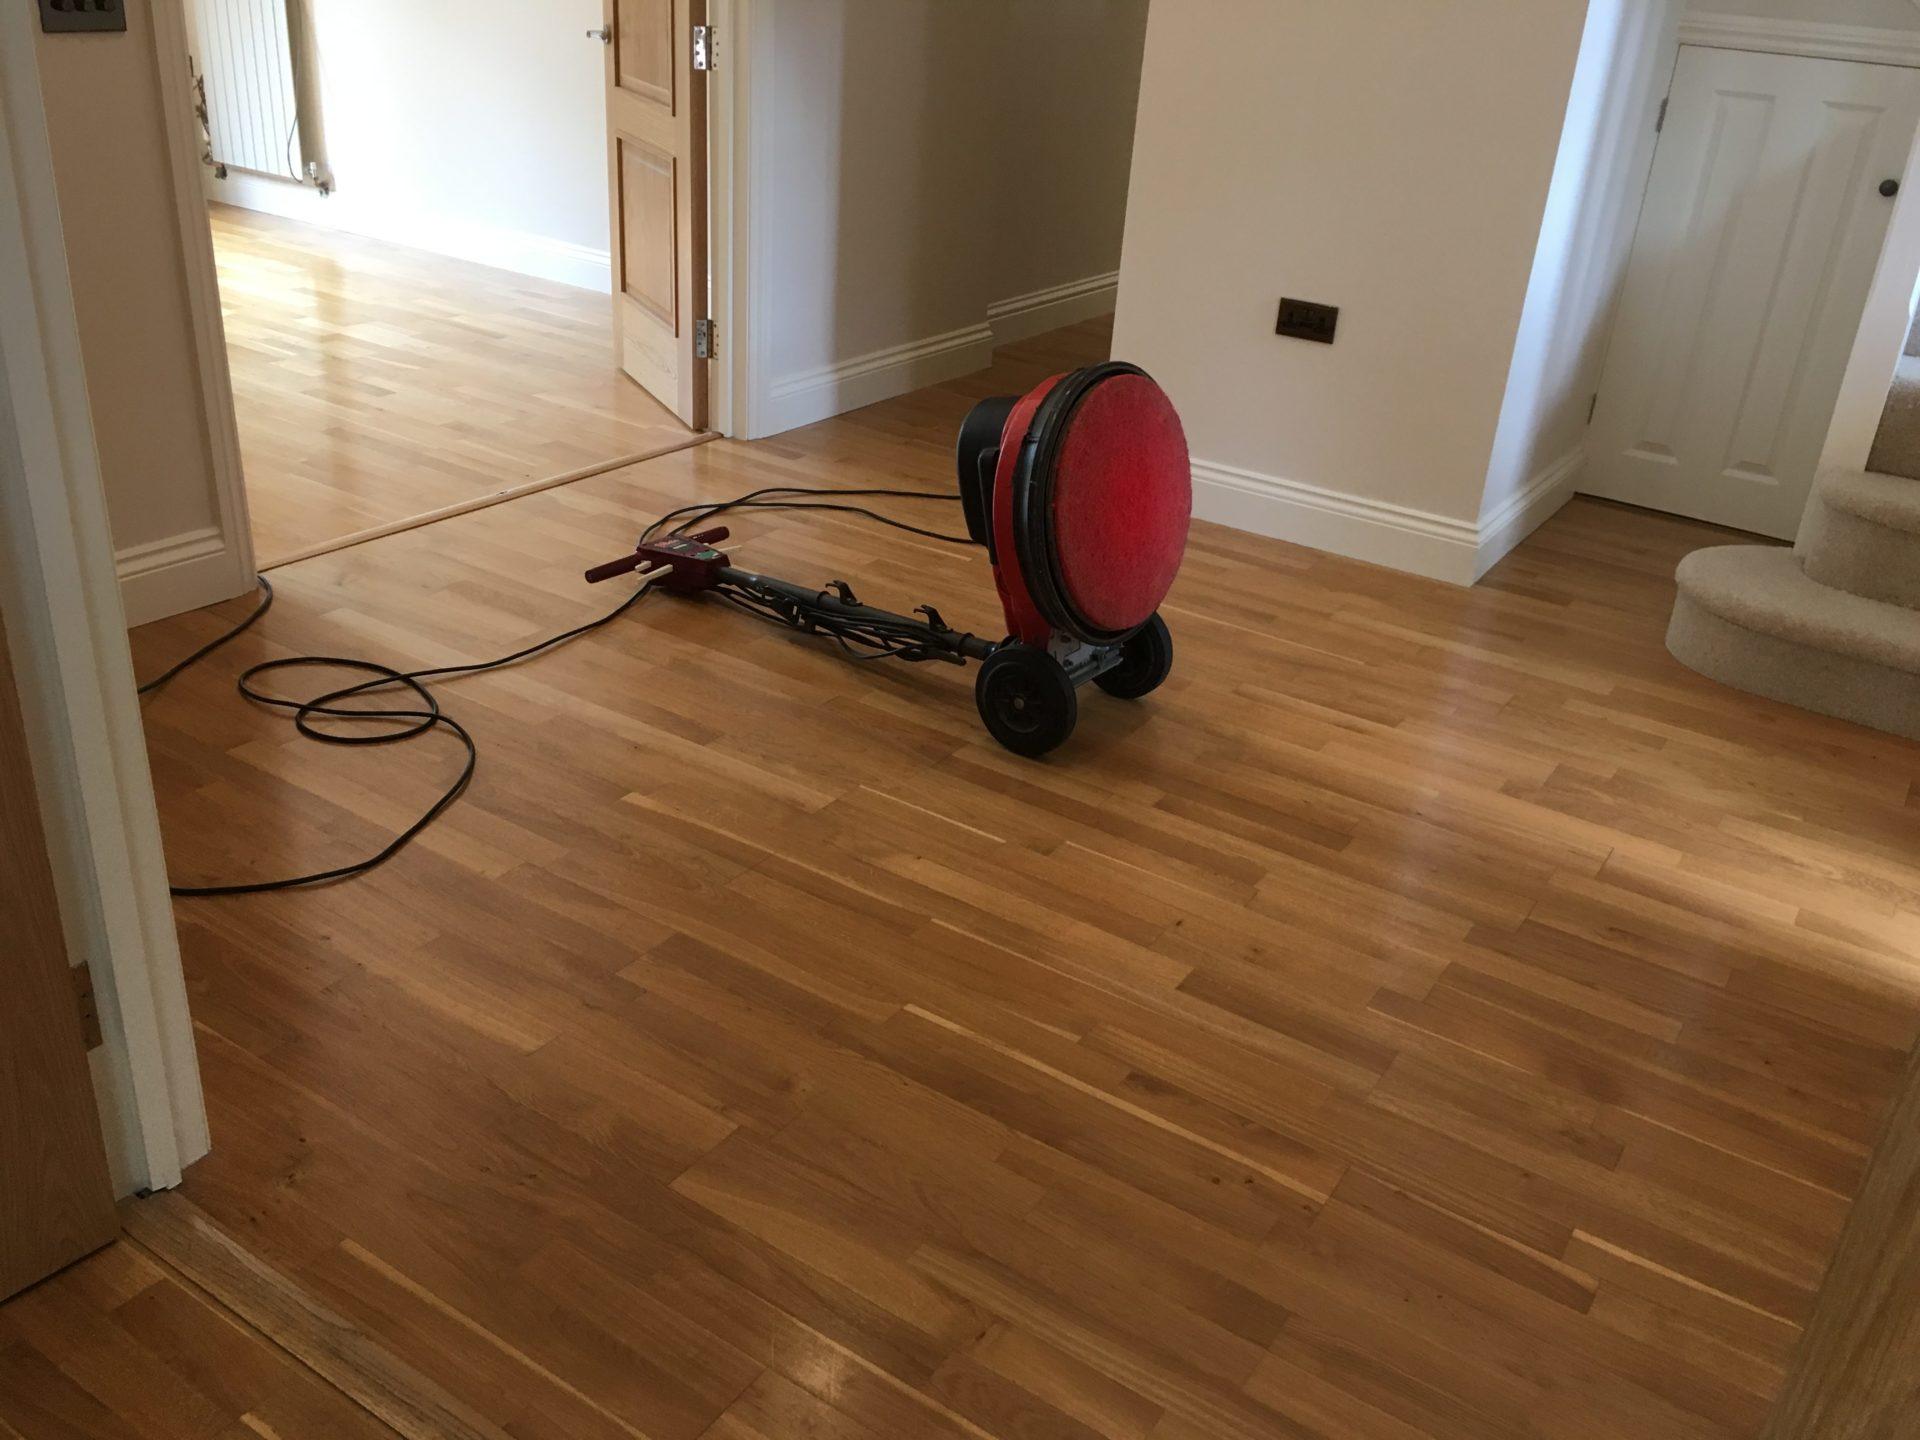 Wood laminate floor cleaning polishing brighton hove for Wood floor maintenance